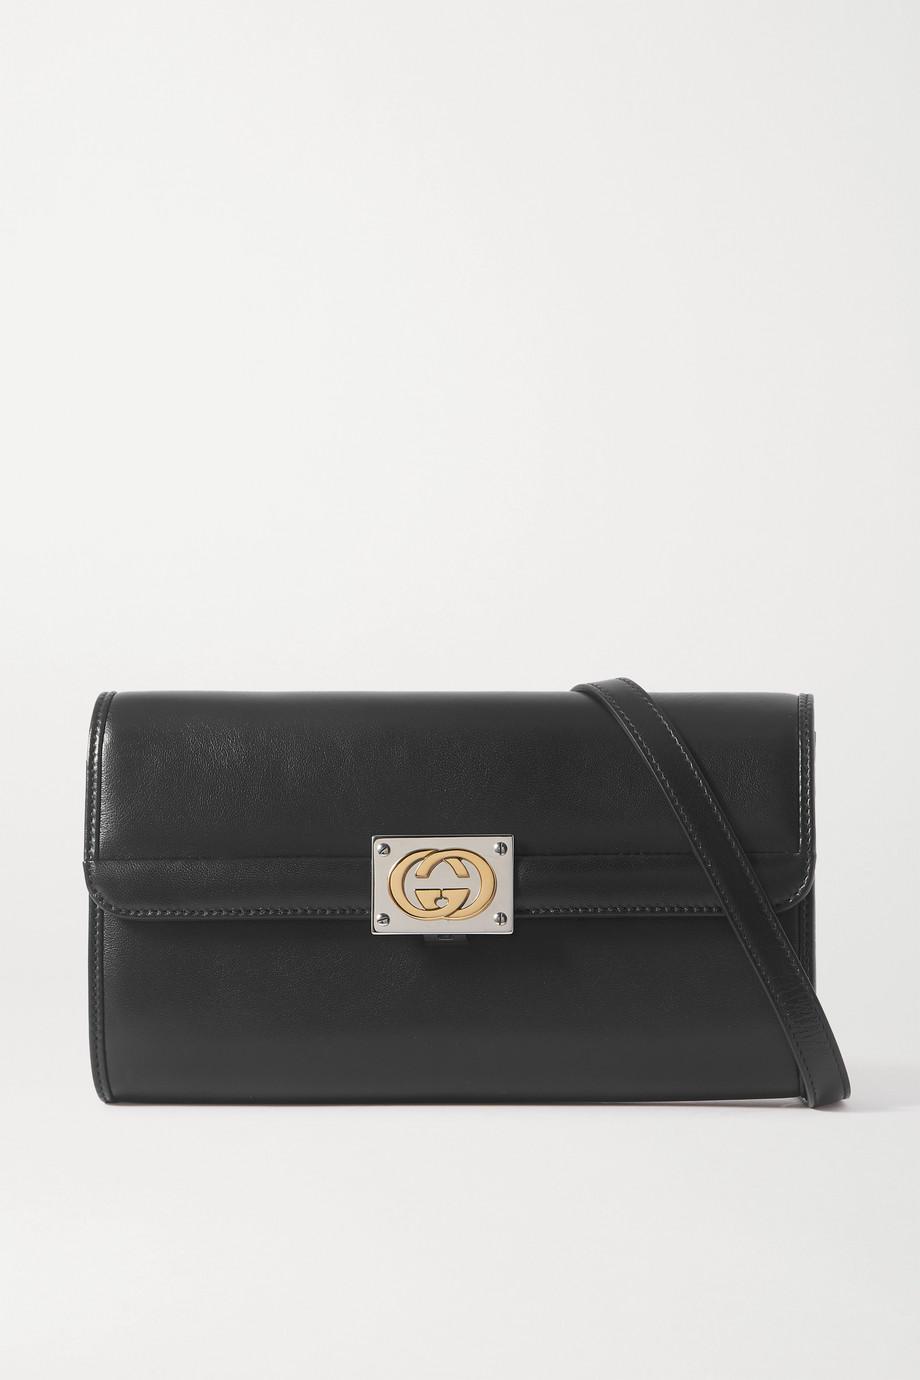 Gucci 【NET SUSTAIN】Linea Matisse 皮革小号单肩包